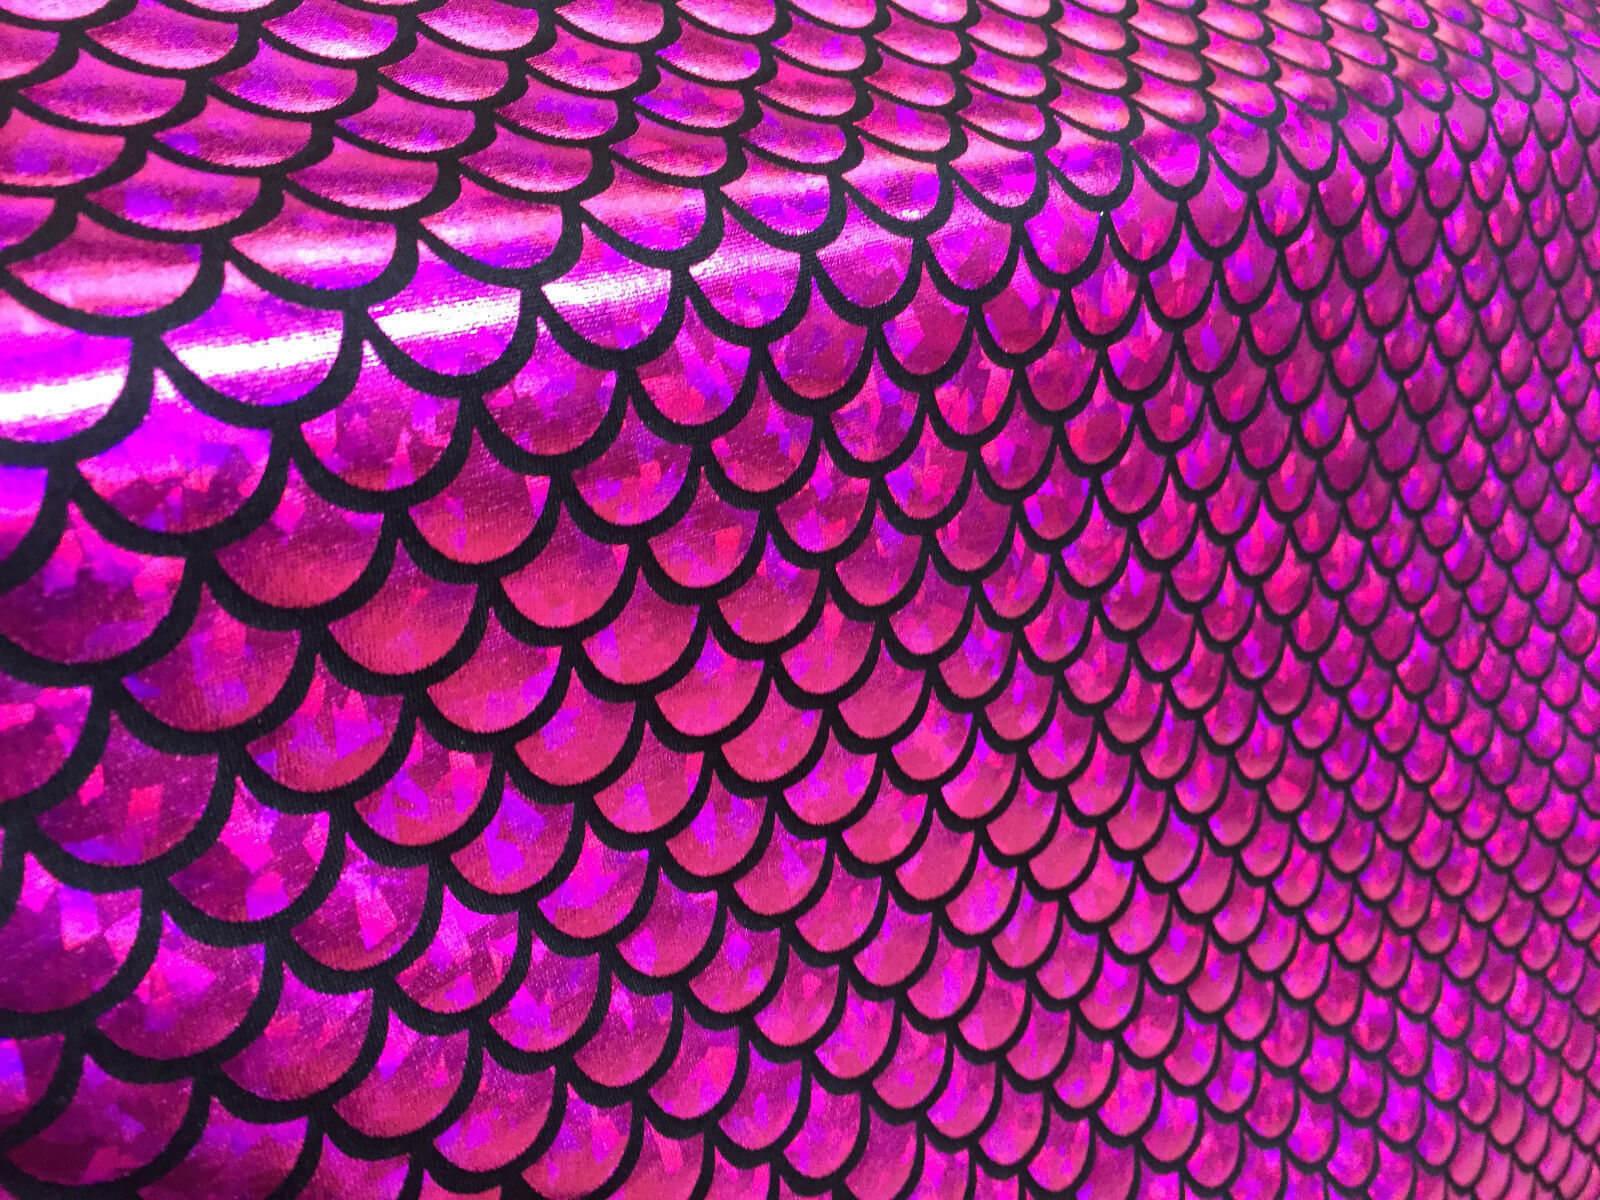 mermaid-scale-fabric-fish-tail-material-stretch-spandex-57-145cm-wide-pink-black-5b6b64991.jpg